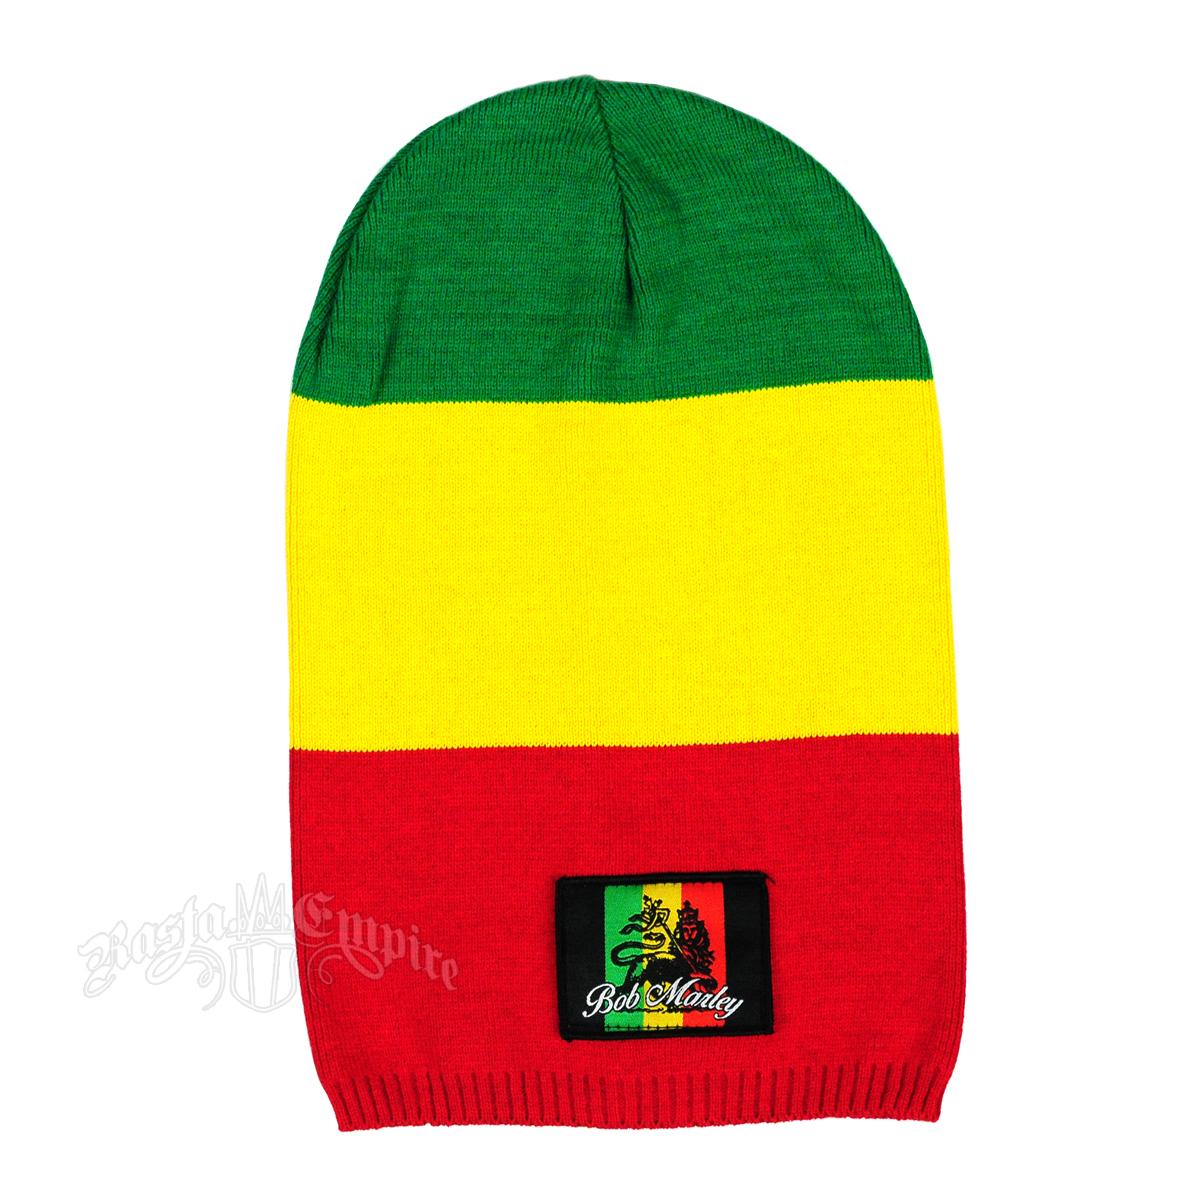 c2f3cfa8f7e21 Bob Marley Rasta Block Stripe Long Beanie   RastaEmpire.com